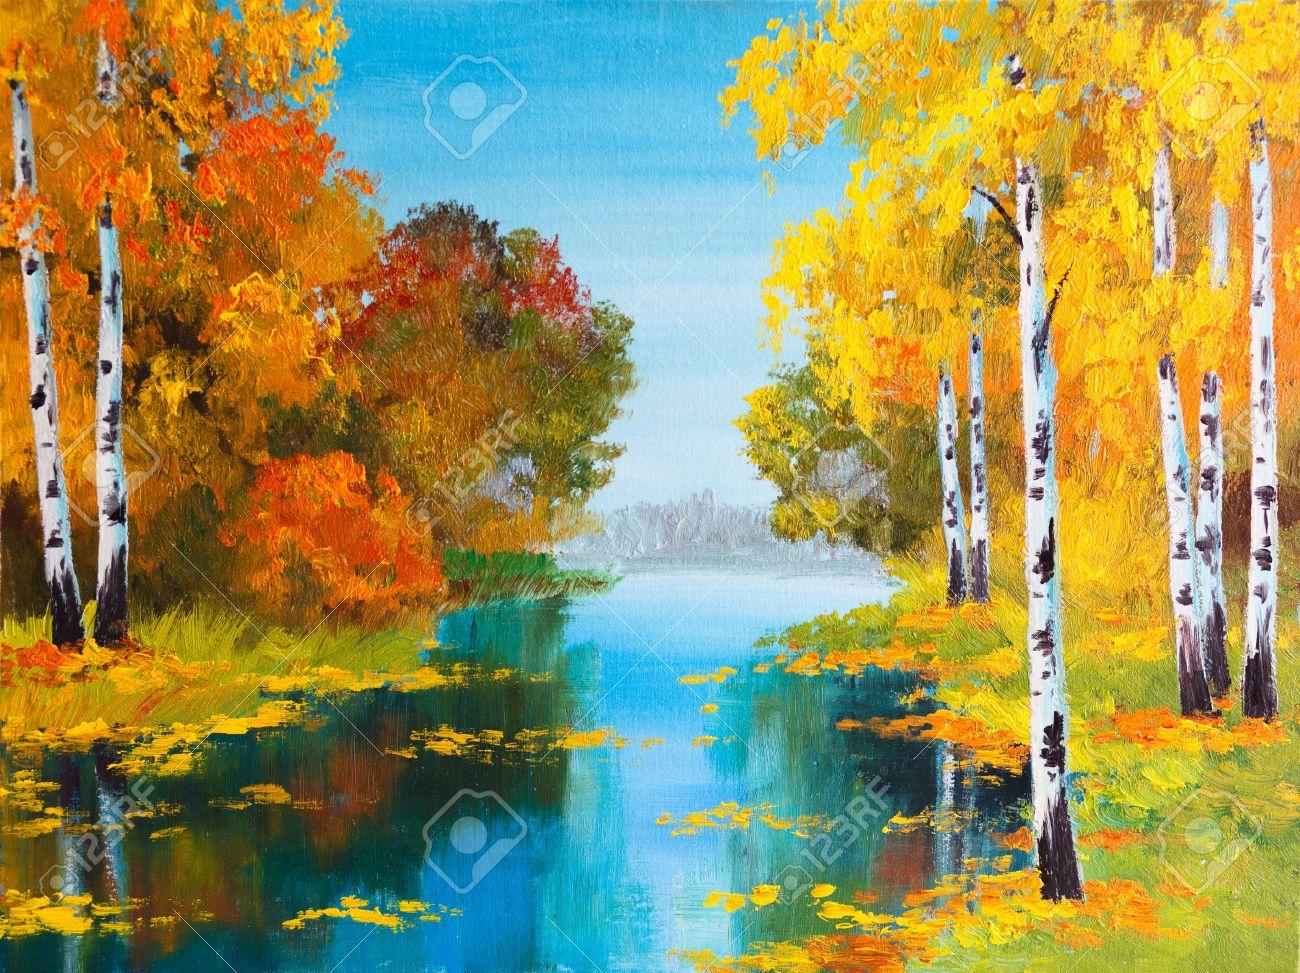 Rainbow landscape original oil pastel drawing - Oil Pastel Drawing Oil Painting Landscape Birch Forest Near The River Stock Photo